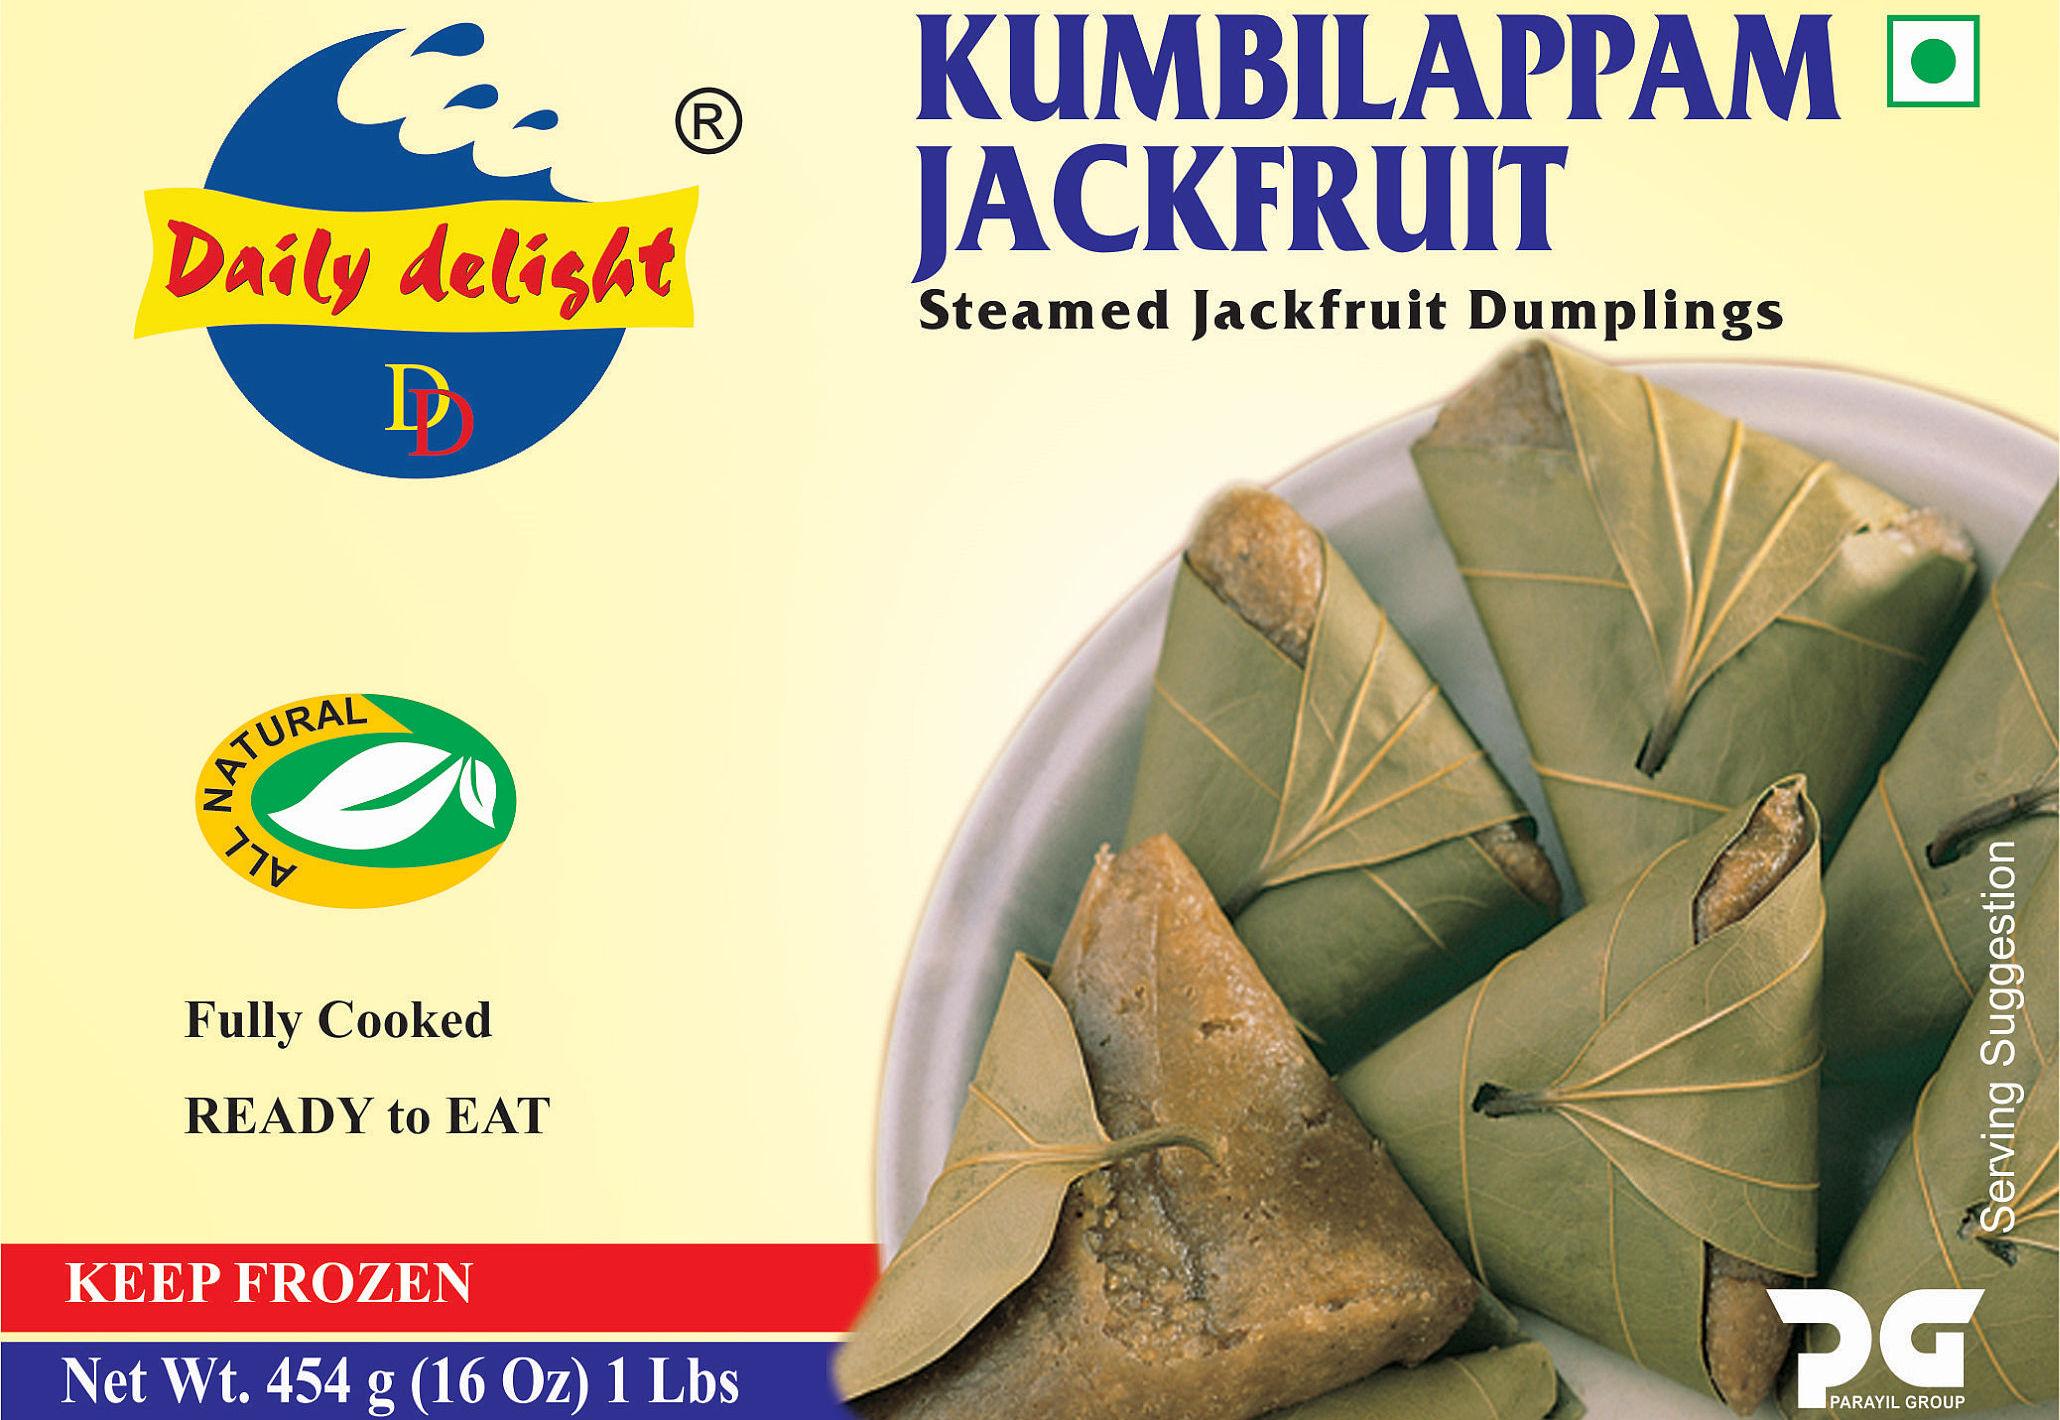 Daily Delight Kumbilappam Jackfruit